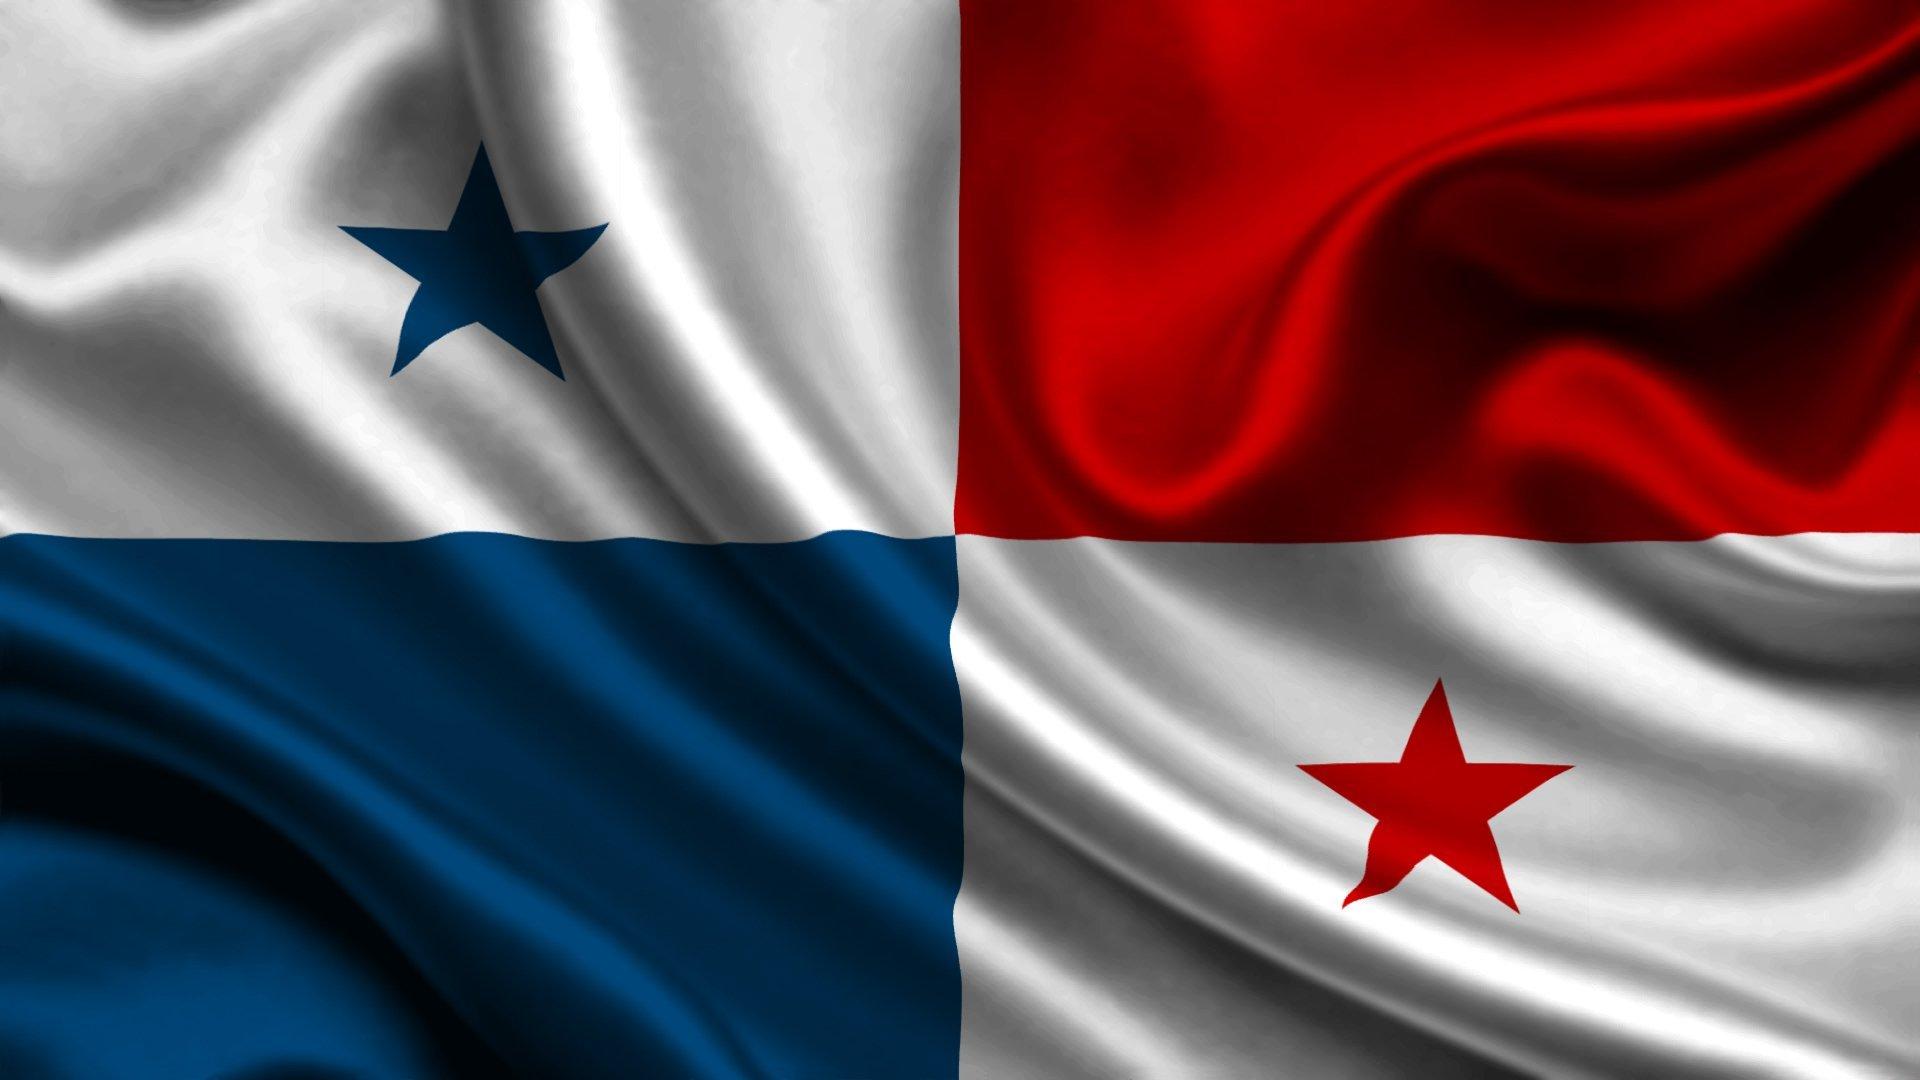 Panama Flag 3 1920x1080